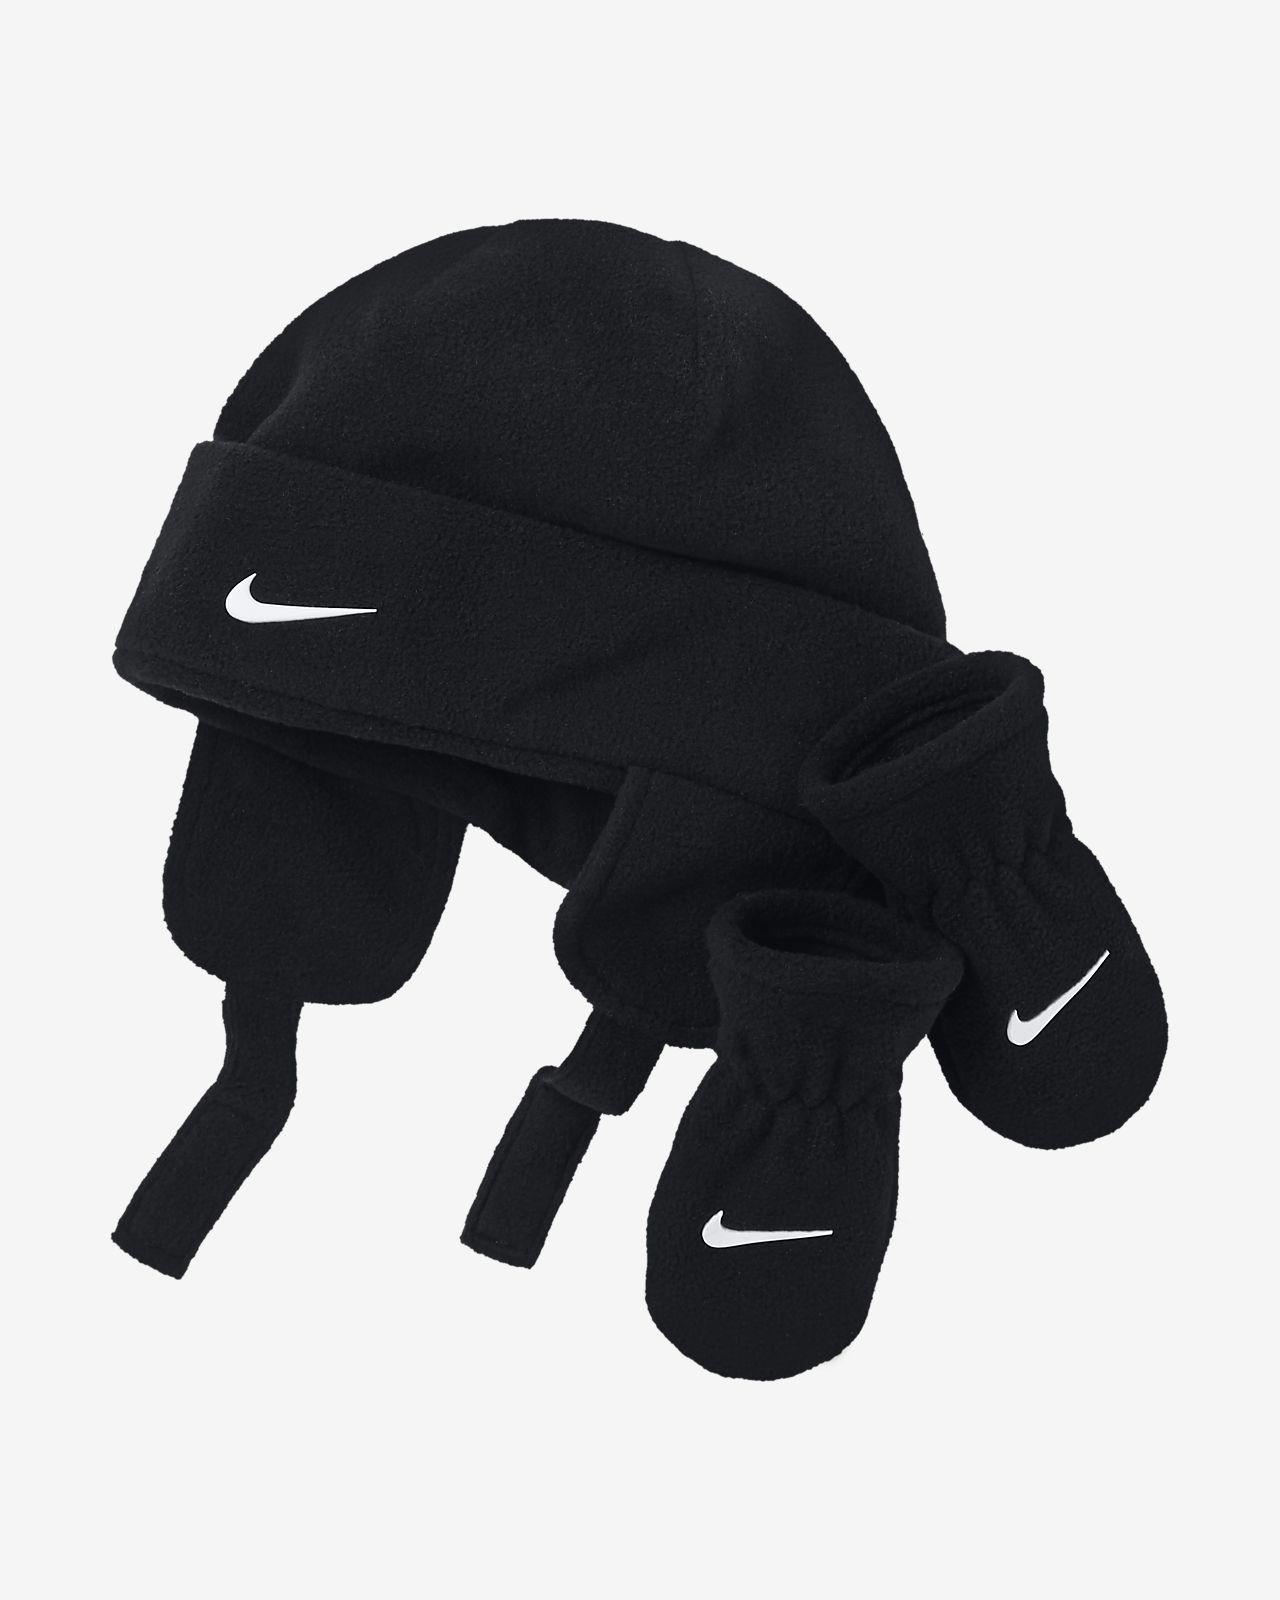 Nike-gaveæske med hue og vanter til babyer